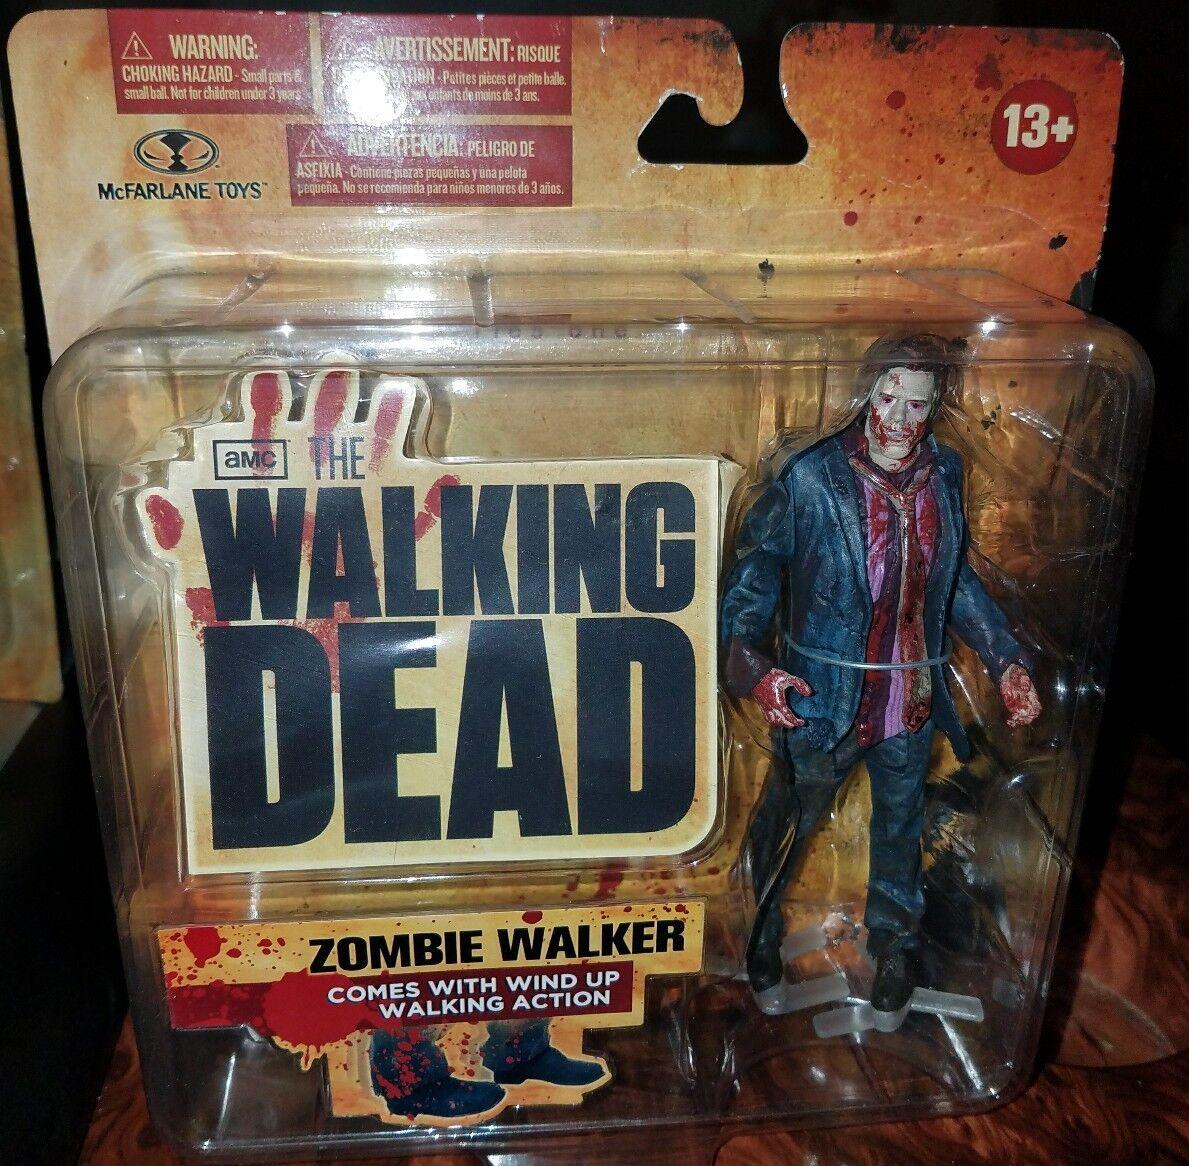 McFarlane Toys Zombie Walker The Walking Dead TV Series 1 Action Figure